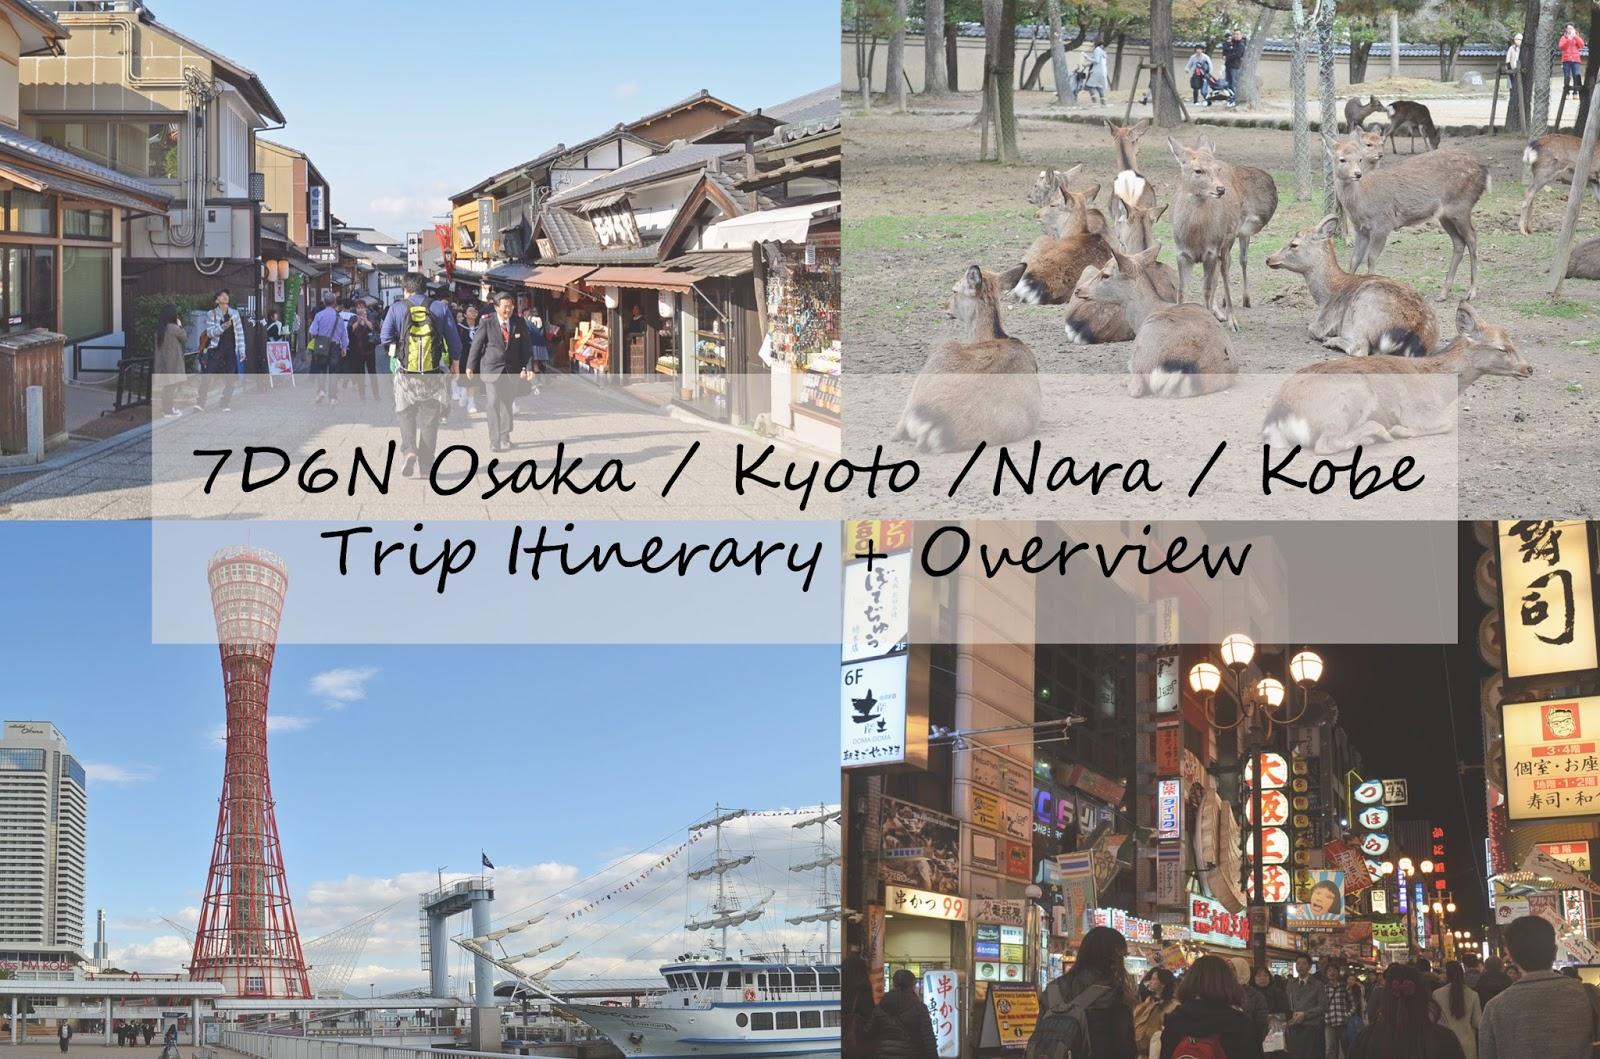 japan 2016 7d6n osaka kyoto nara kobe trip itinerary